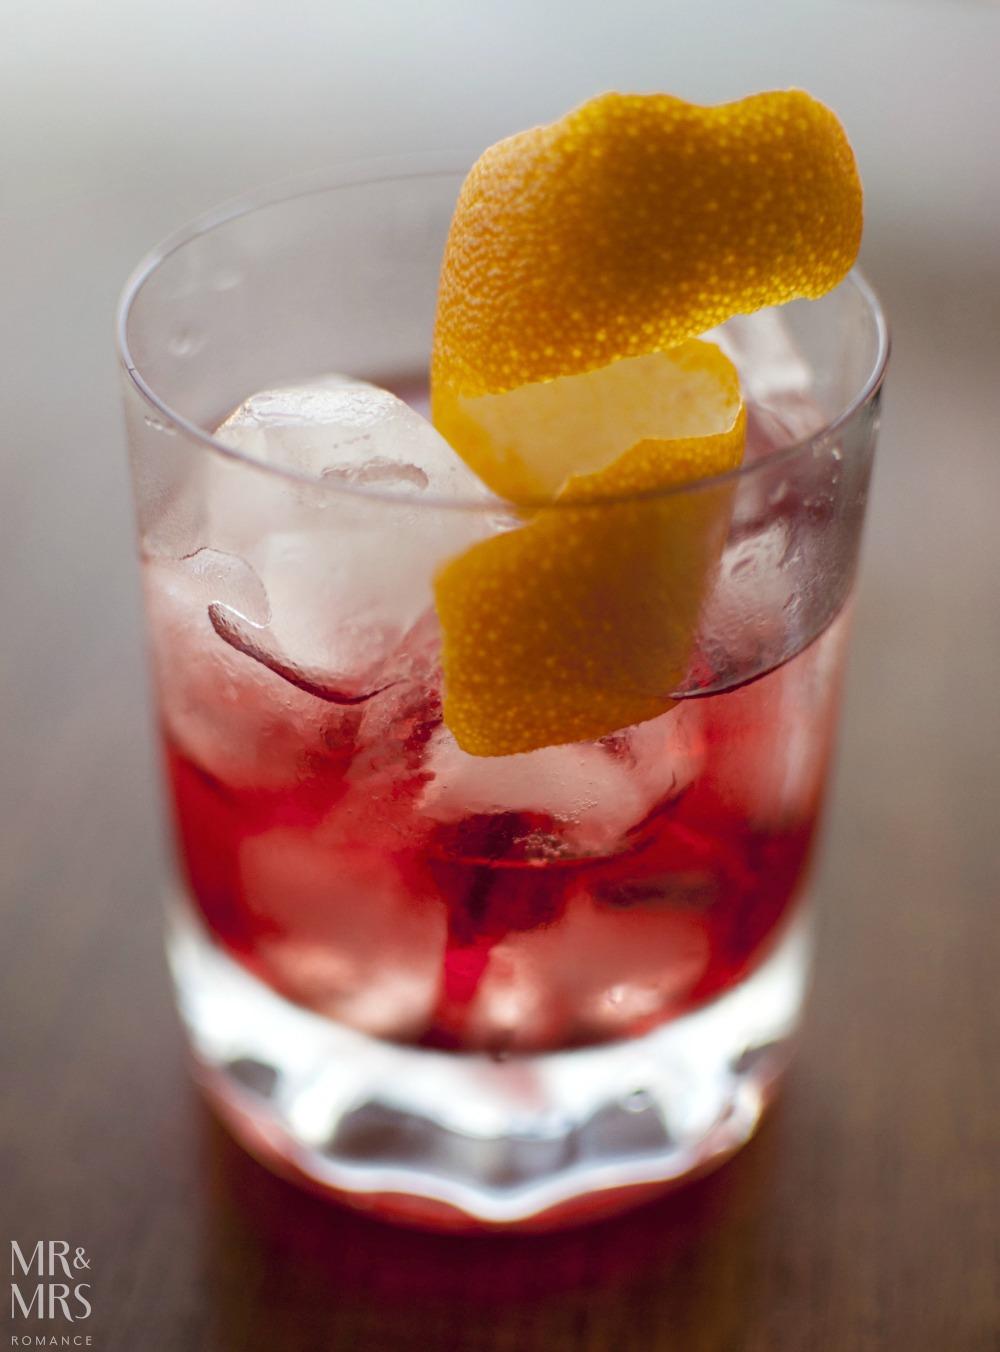 Sloe gin negroni recipe - Mr and Mrs Romance